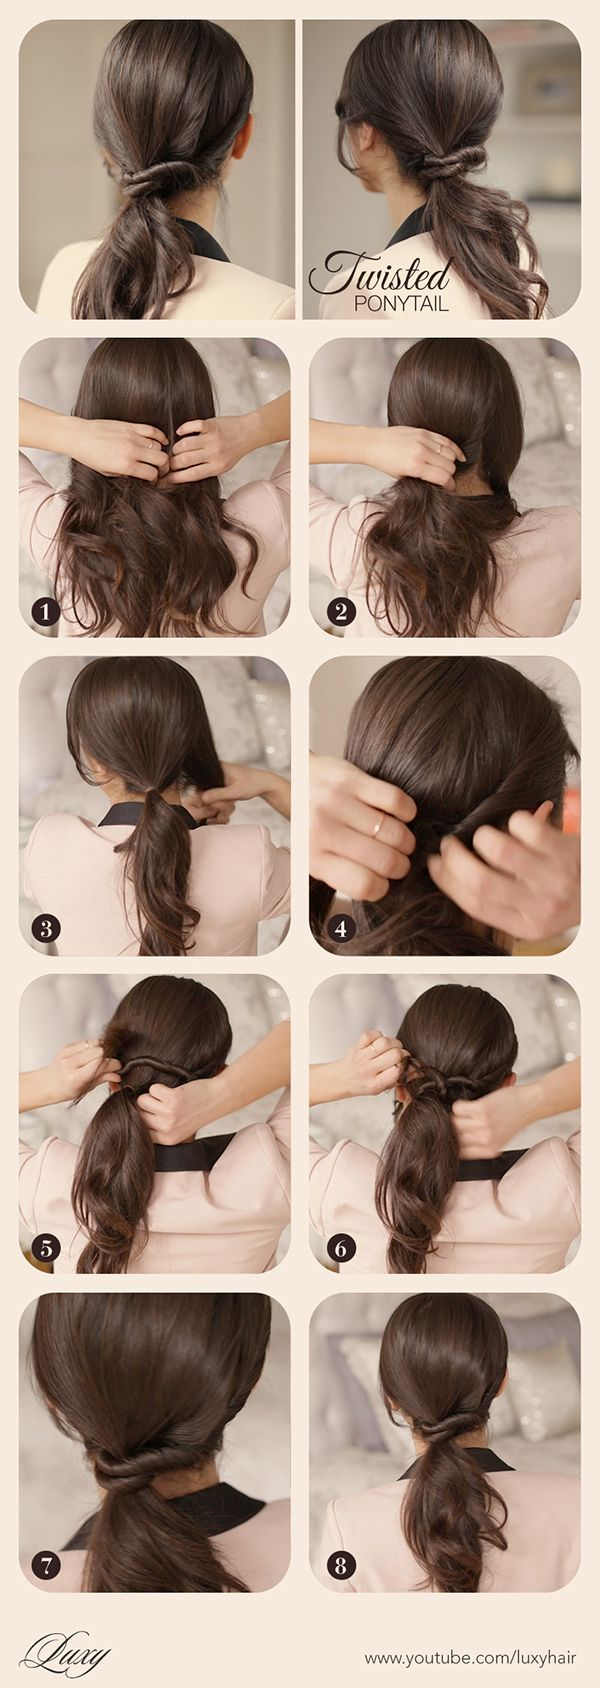 best 25+ twisted ponytail ideas on pinterest | twist ponytail